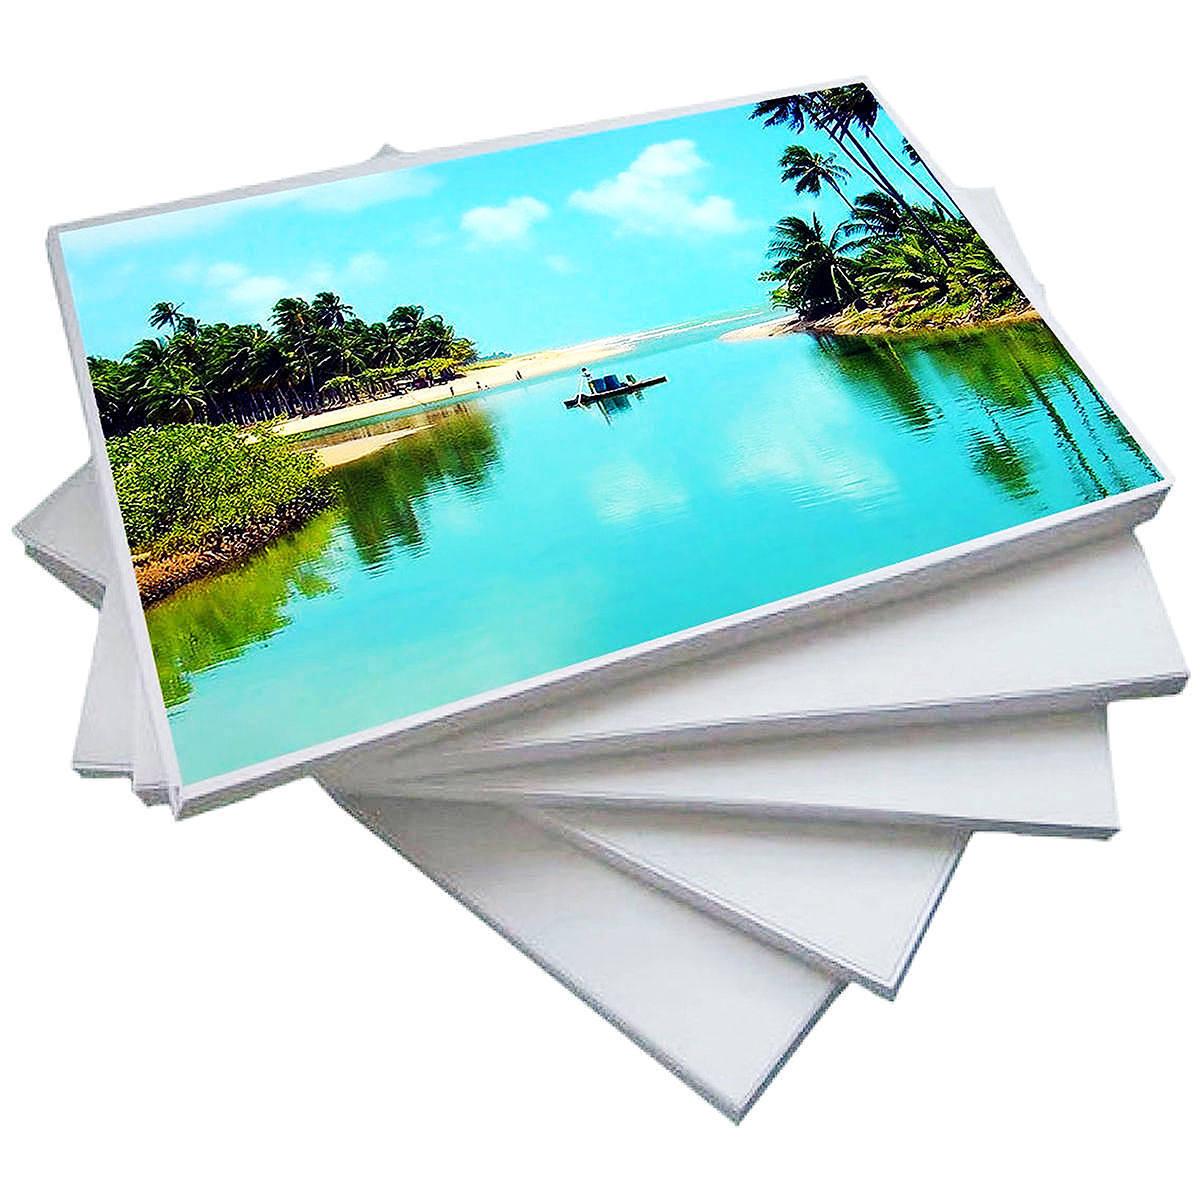 Papel Fotográfico Dupla Face 120g A4 Glossy Branco Brilhante Resistente à Água / 500 Folhas